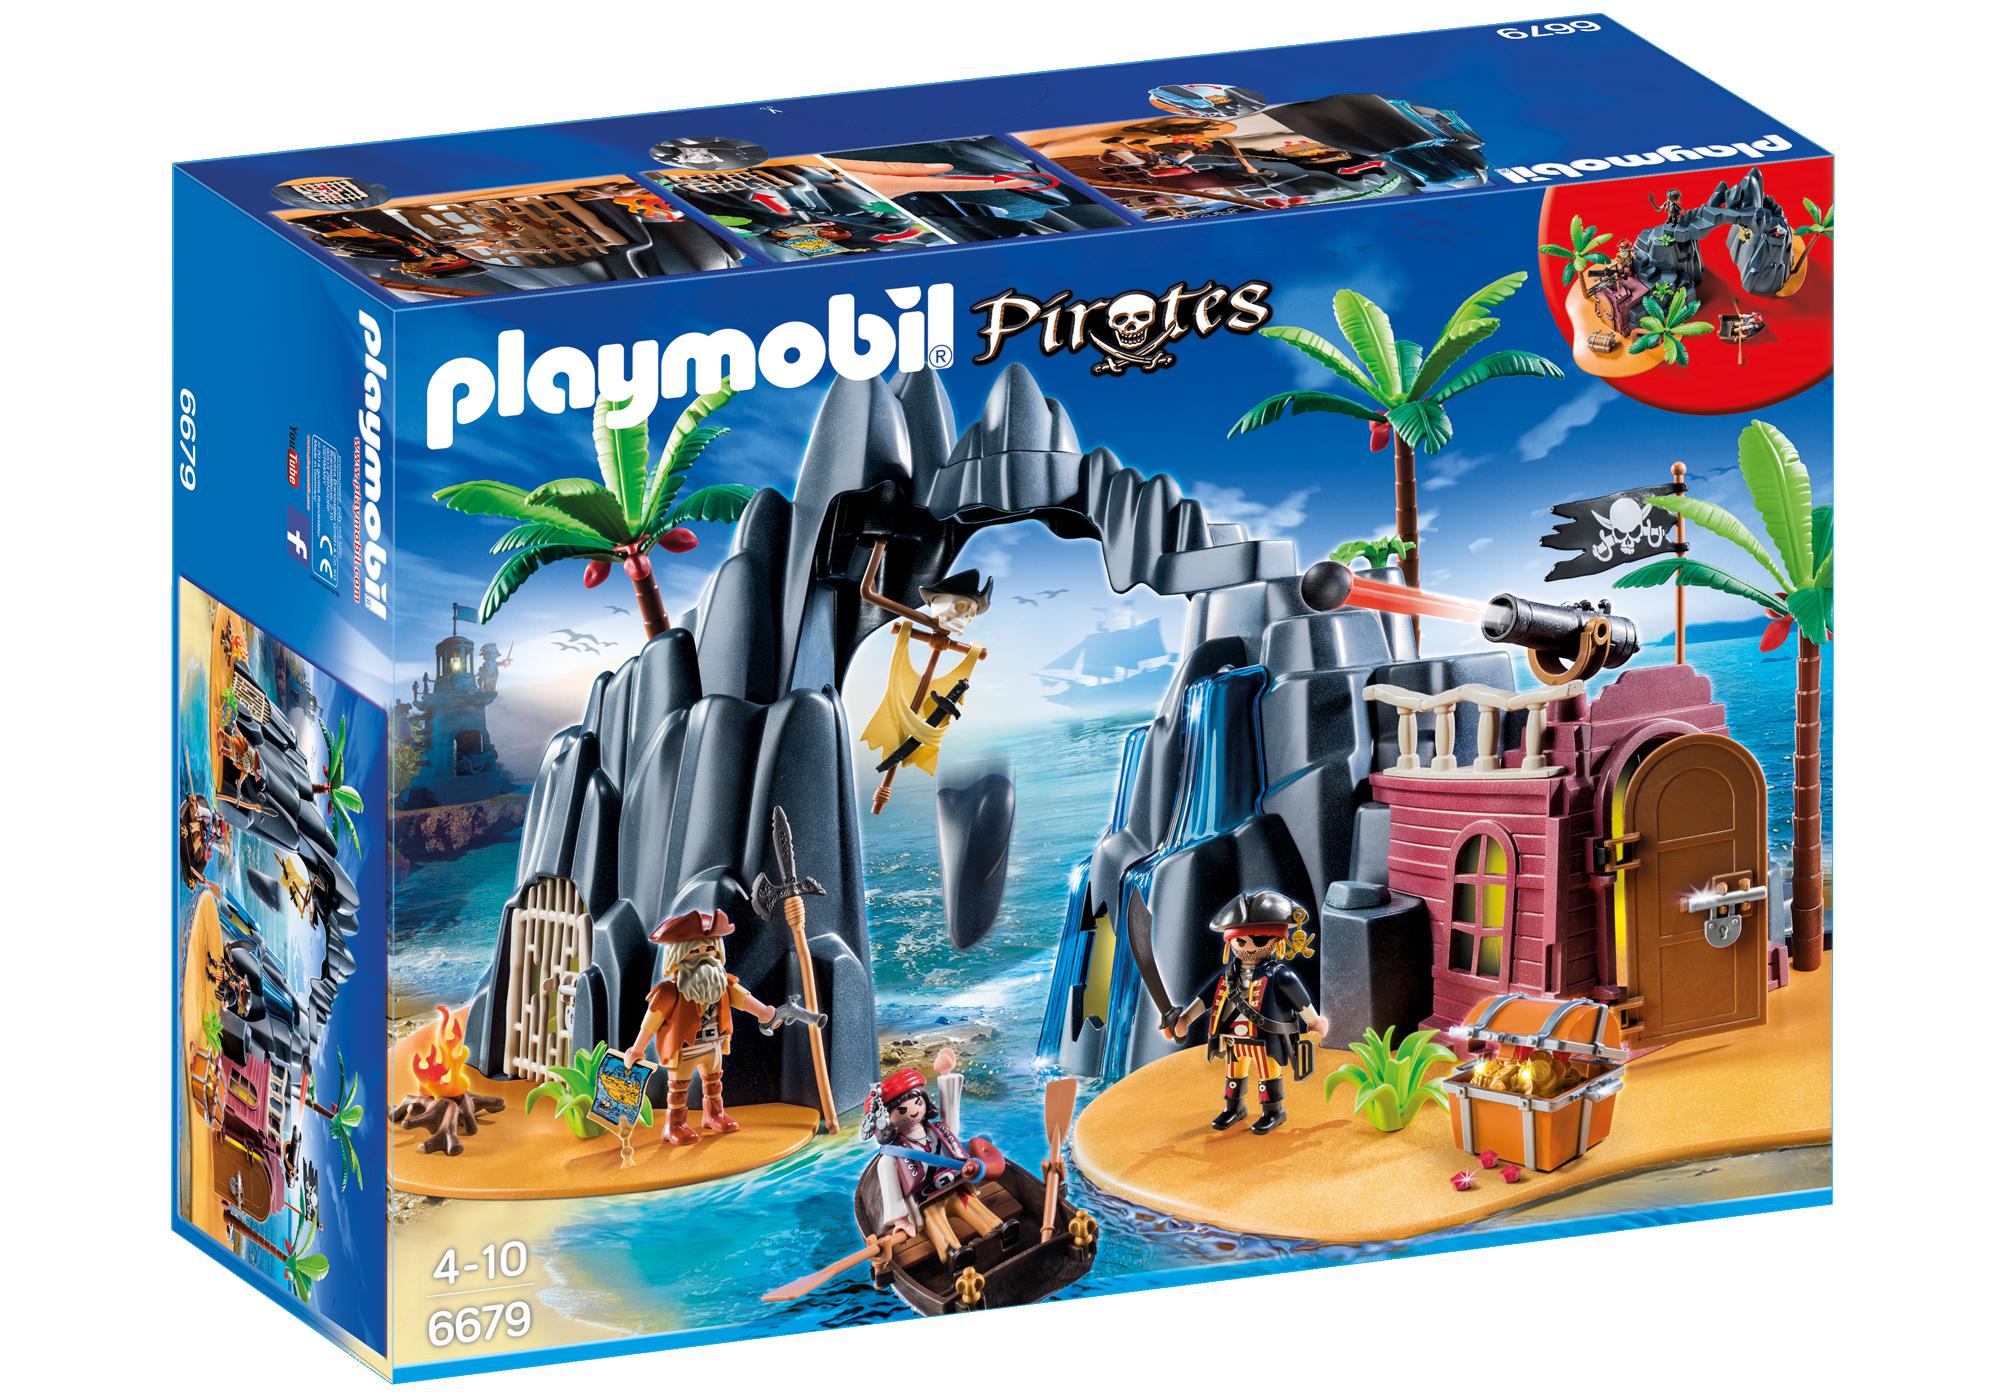 http://media.playmobil.com/i/playmobil/6679_product_box_front